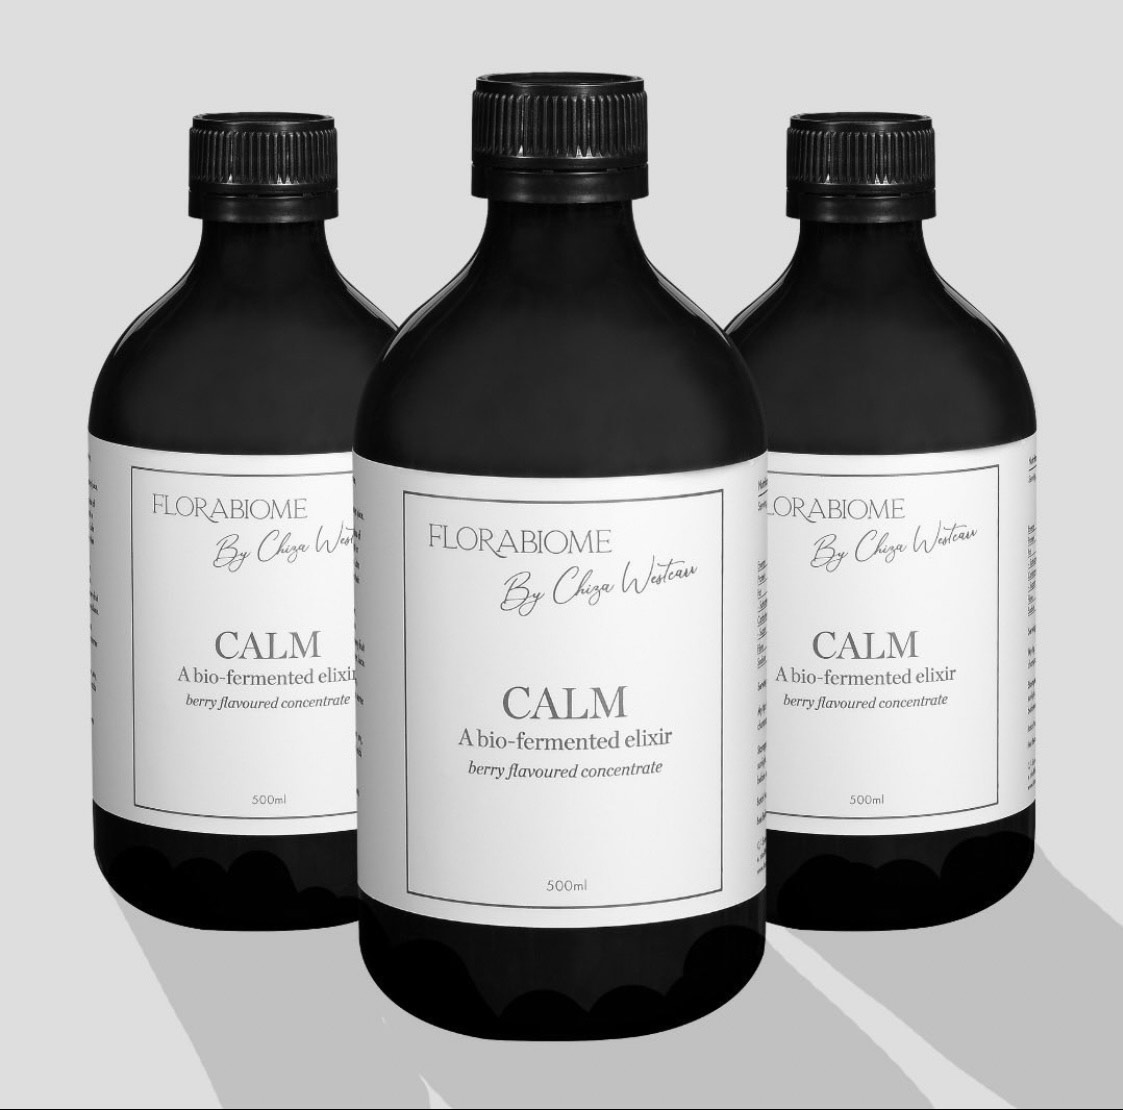 florabiome-calm